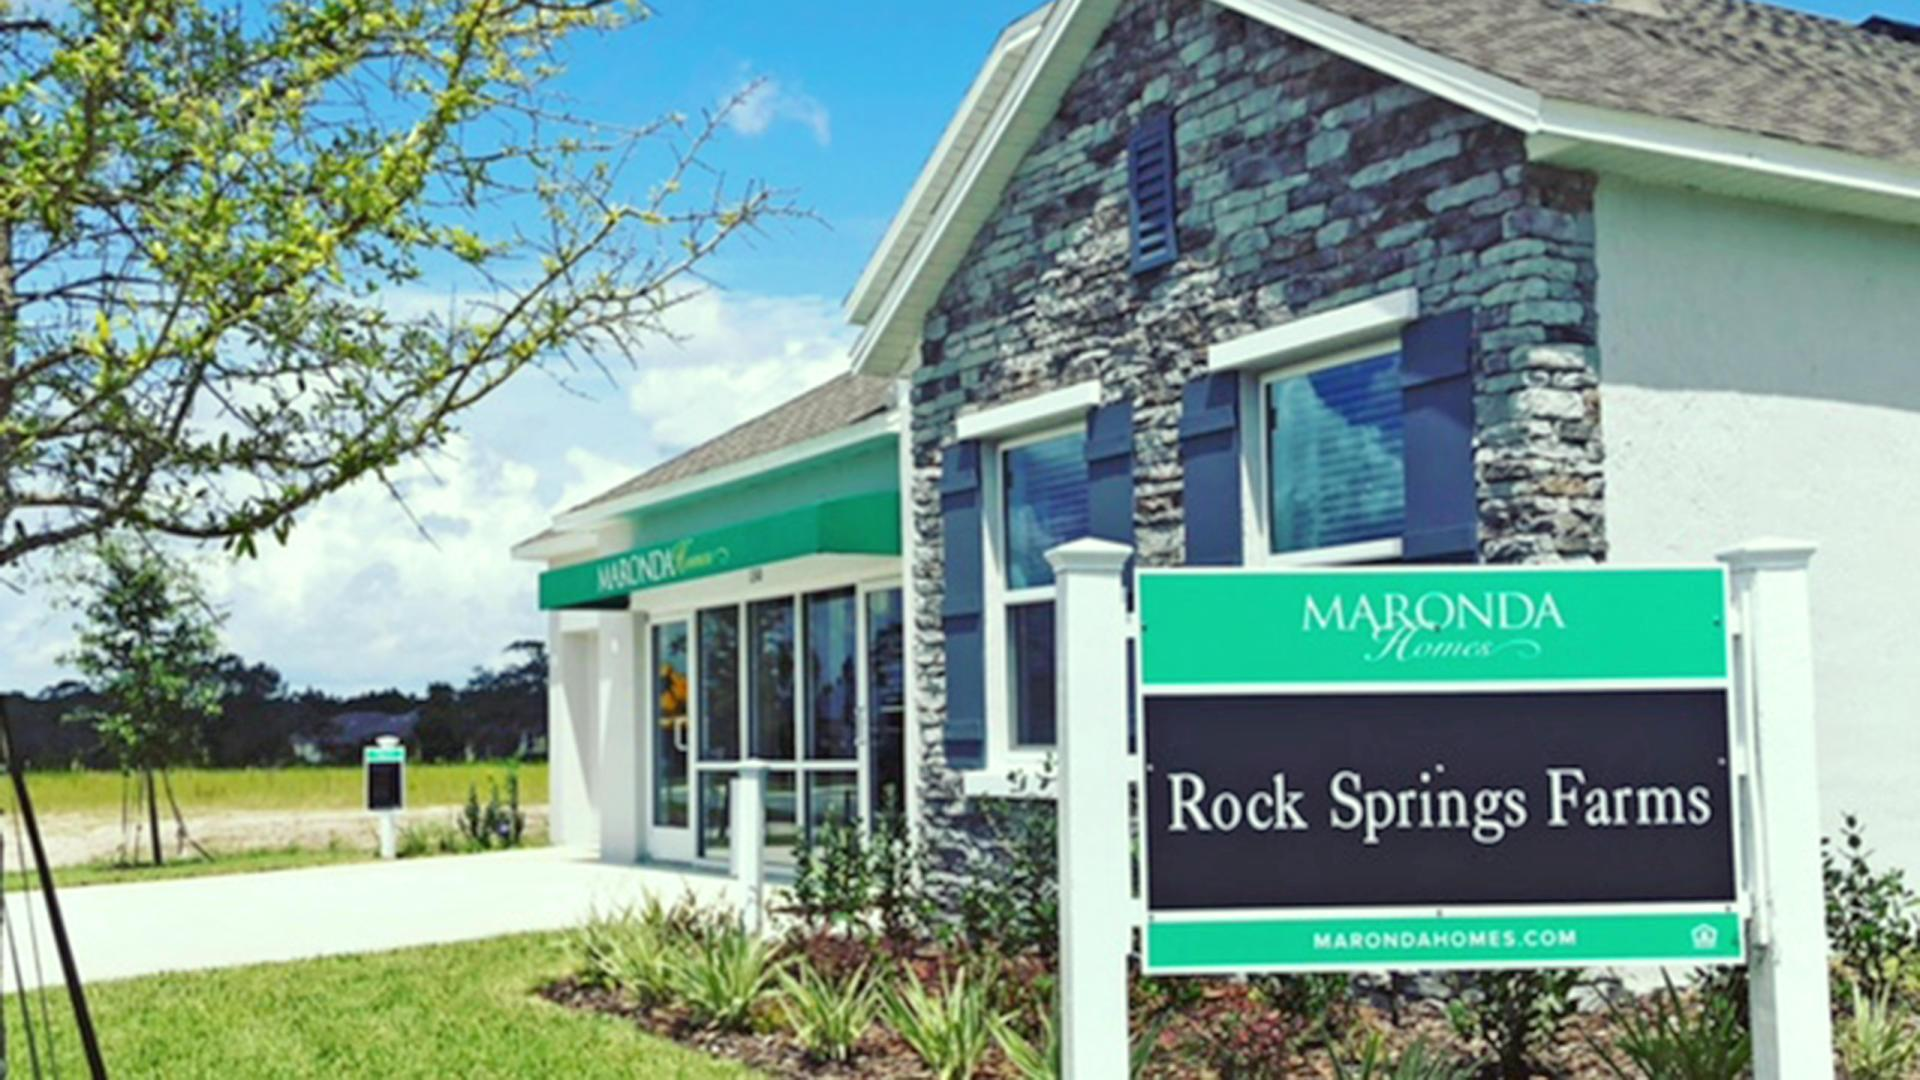 Rock Springs Farms,32086